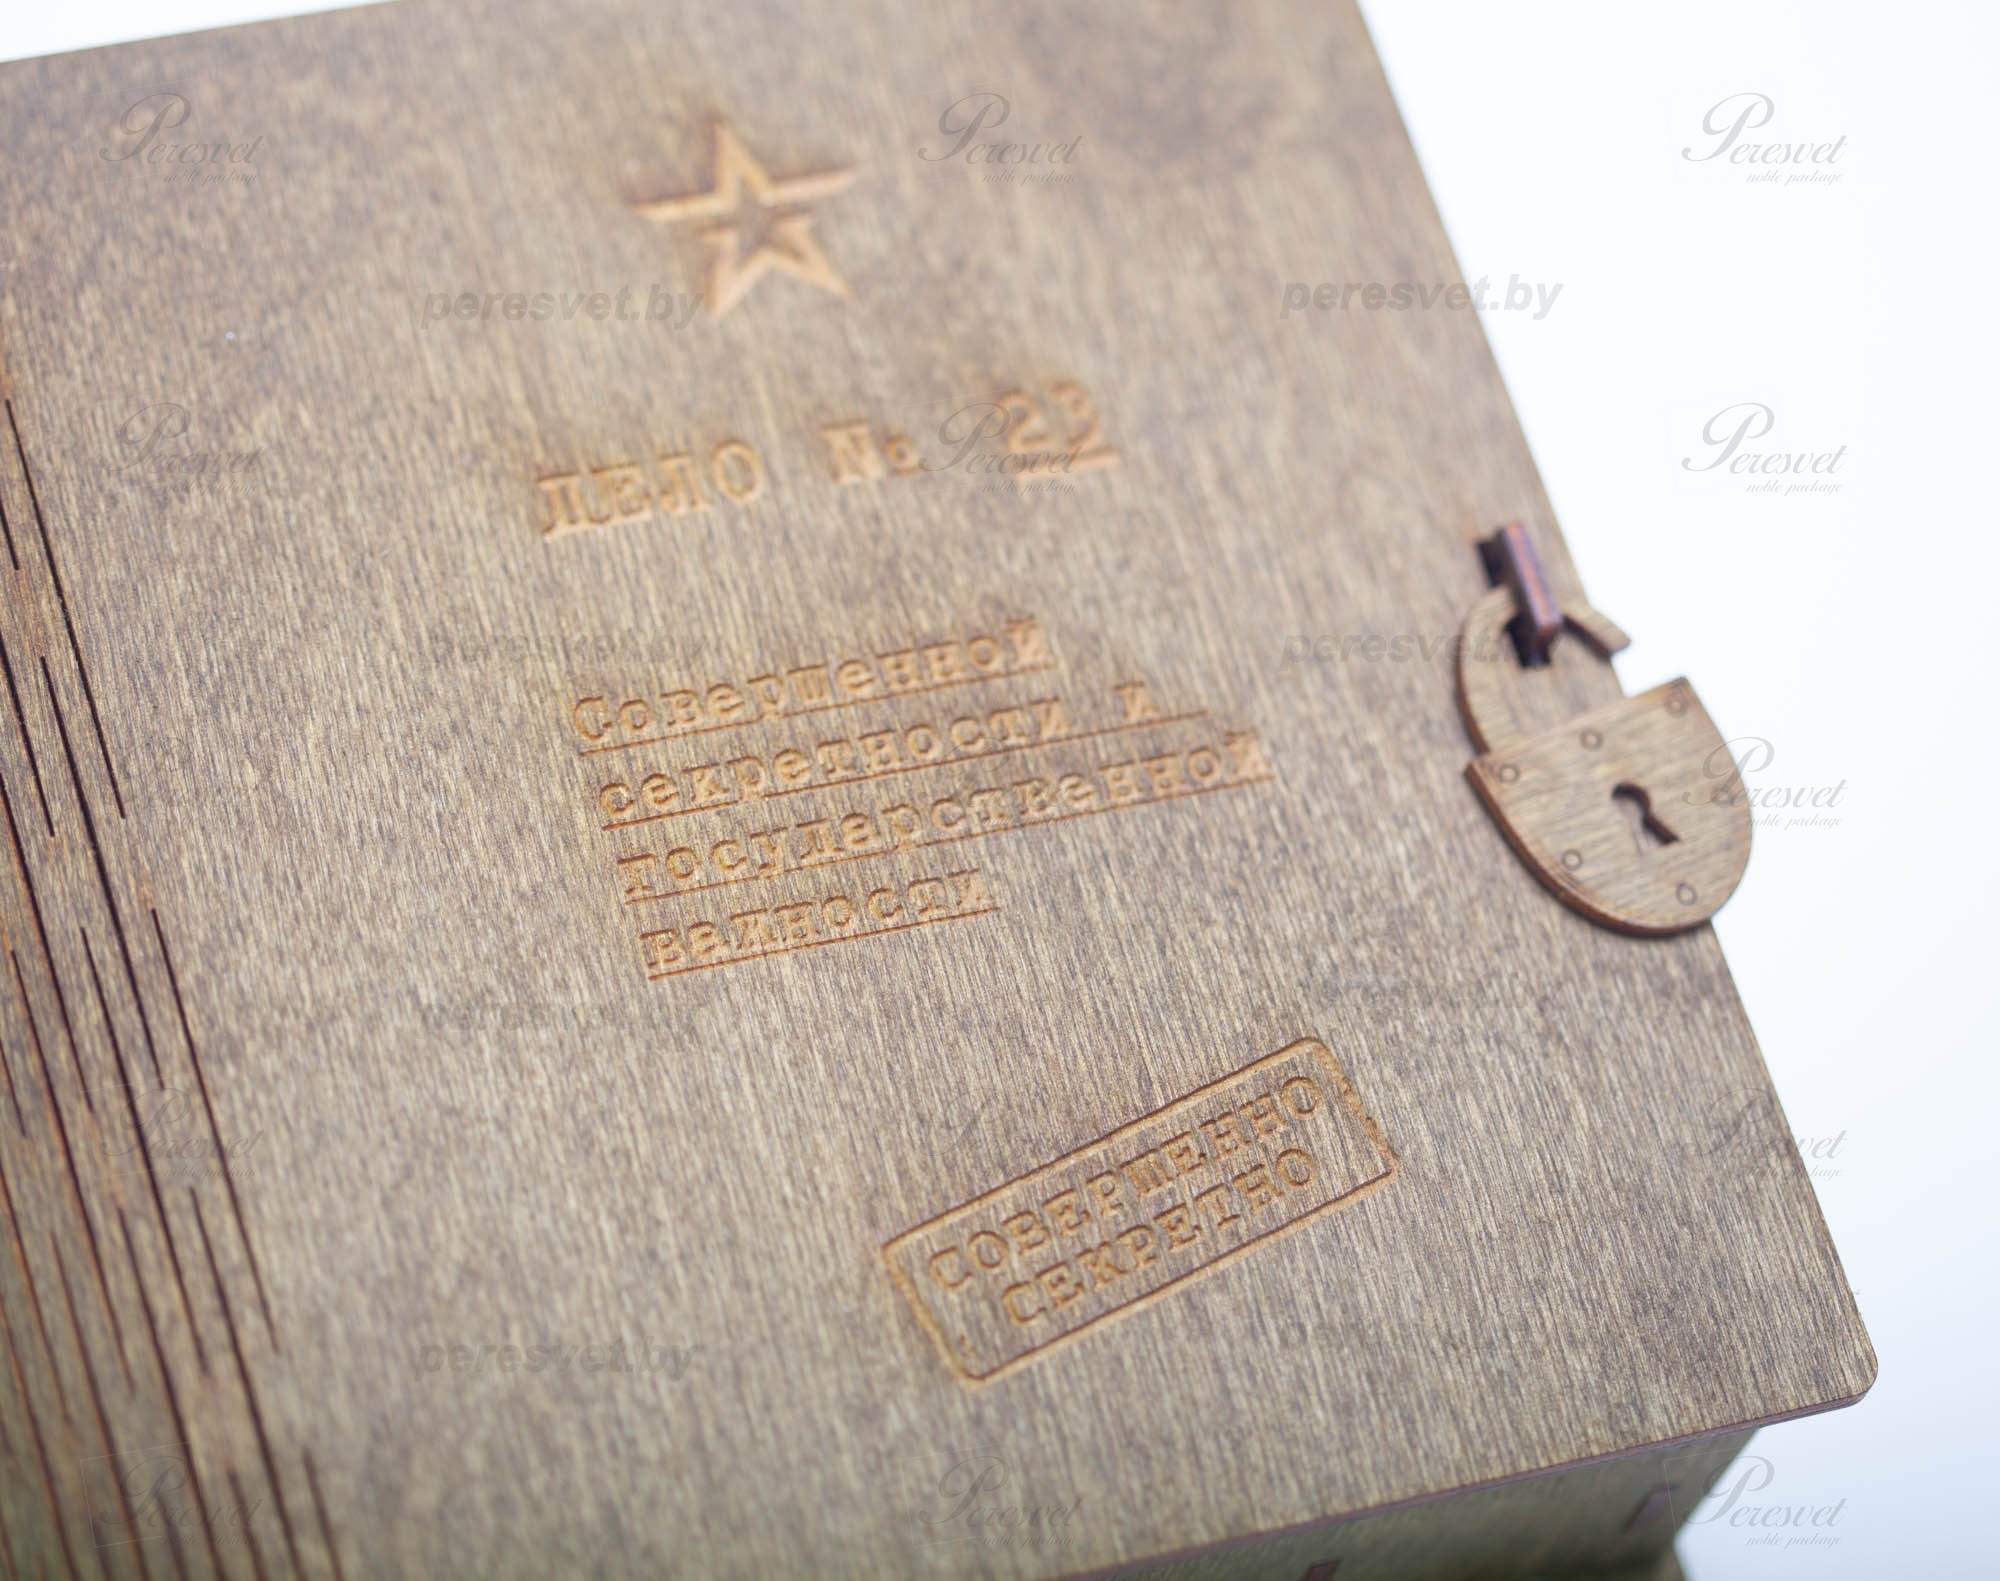 Новогодний корпоративный подарок Секретный томик мини опт на peresvet.by